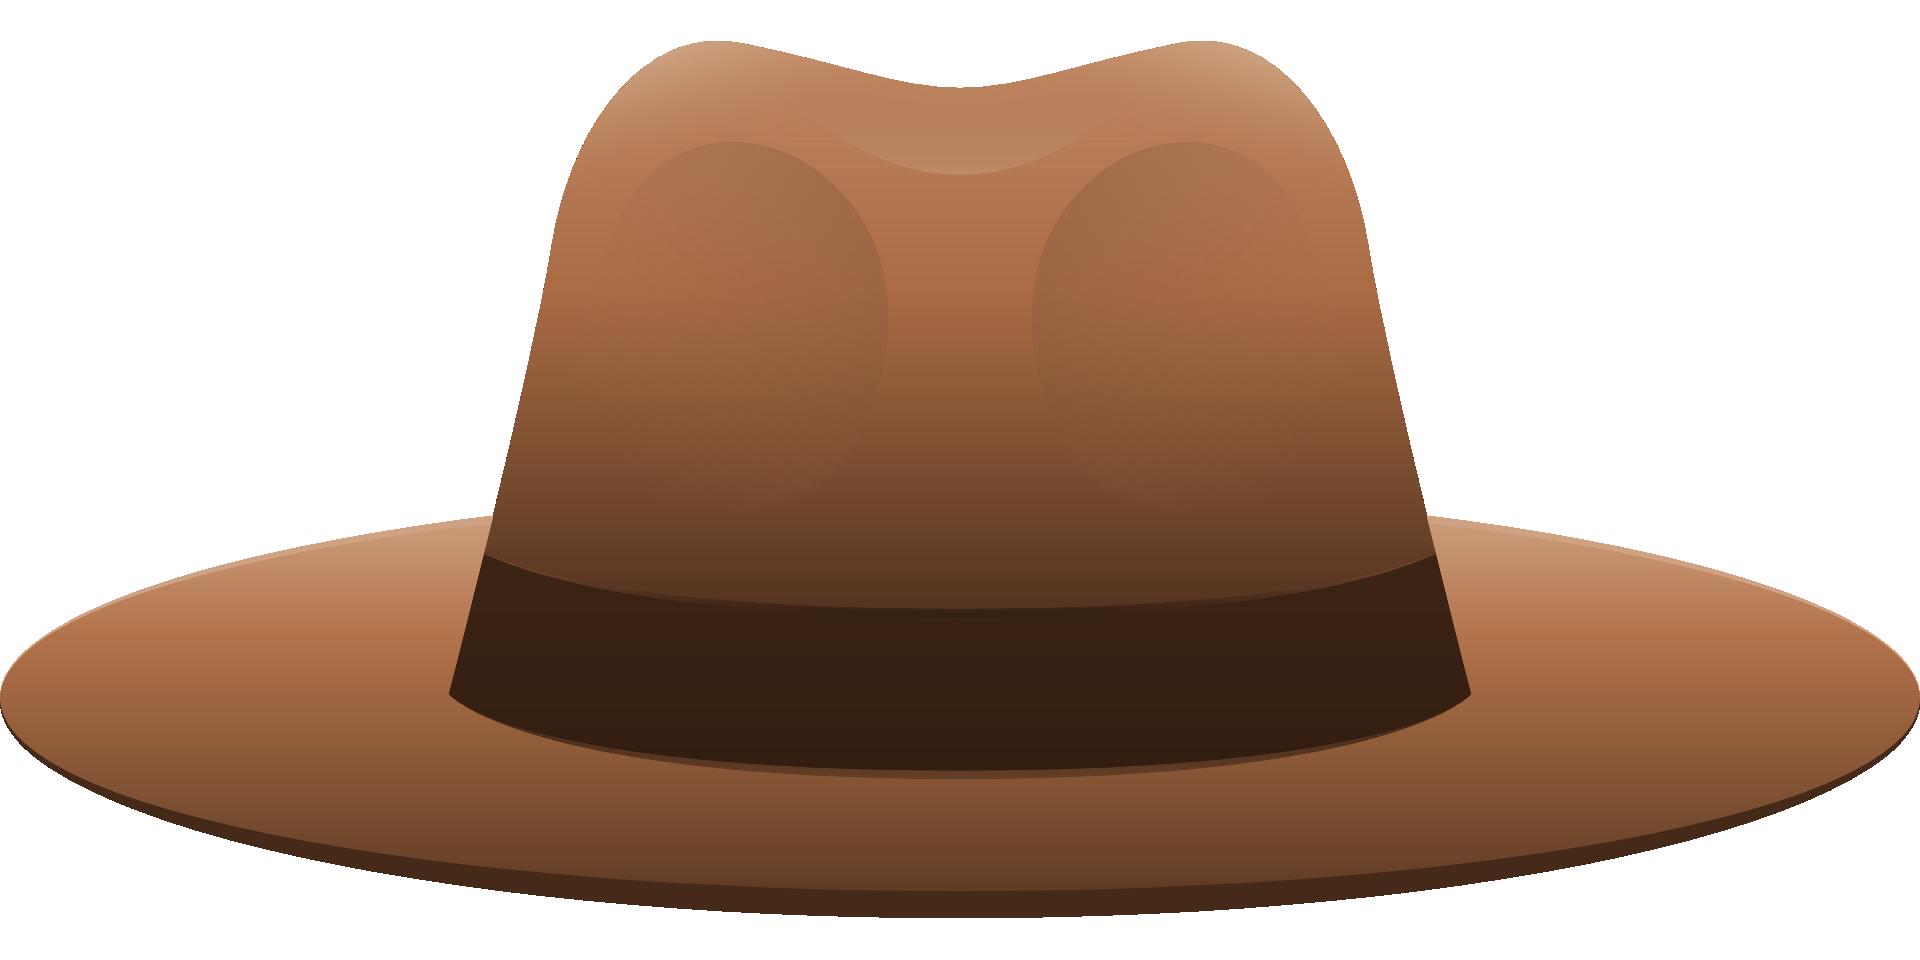 Hat Vector PNG Transparent Image - Hat PNG